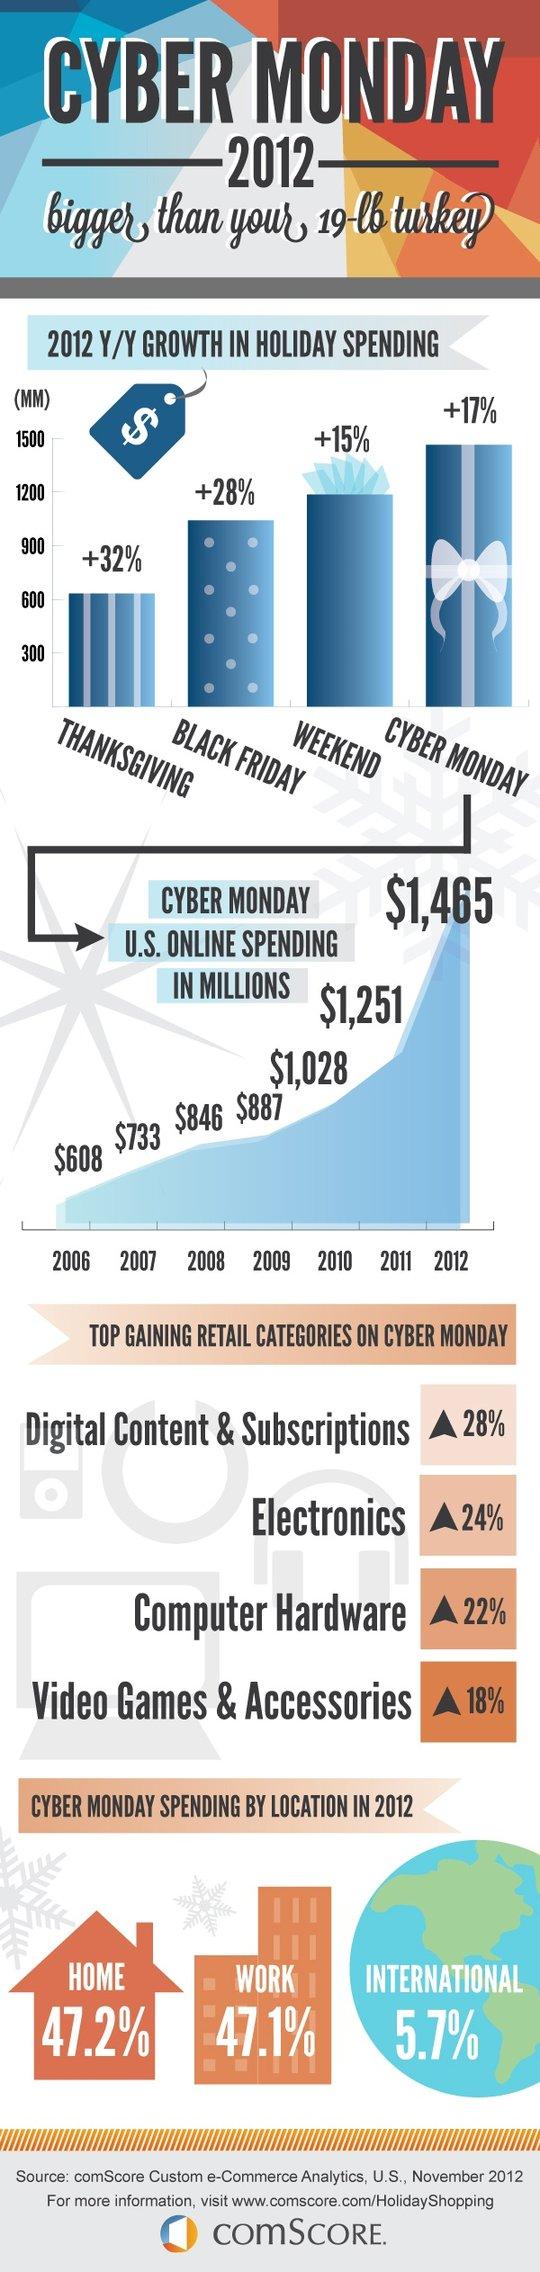 CyberMonday statistics 2012